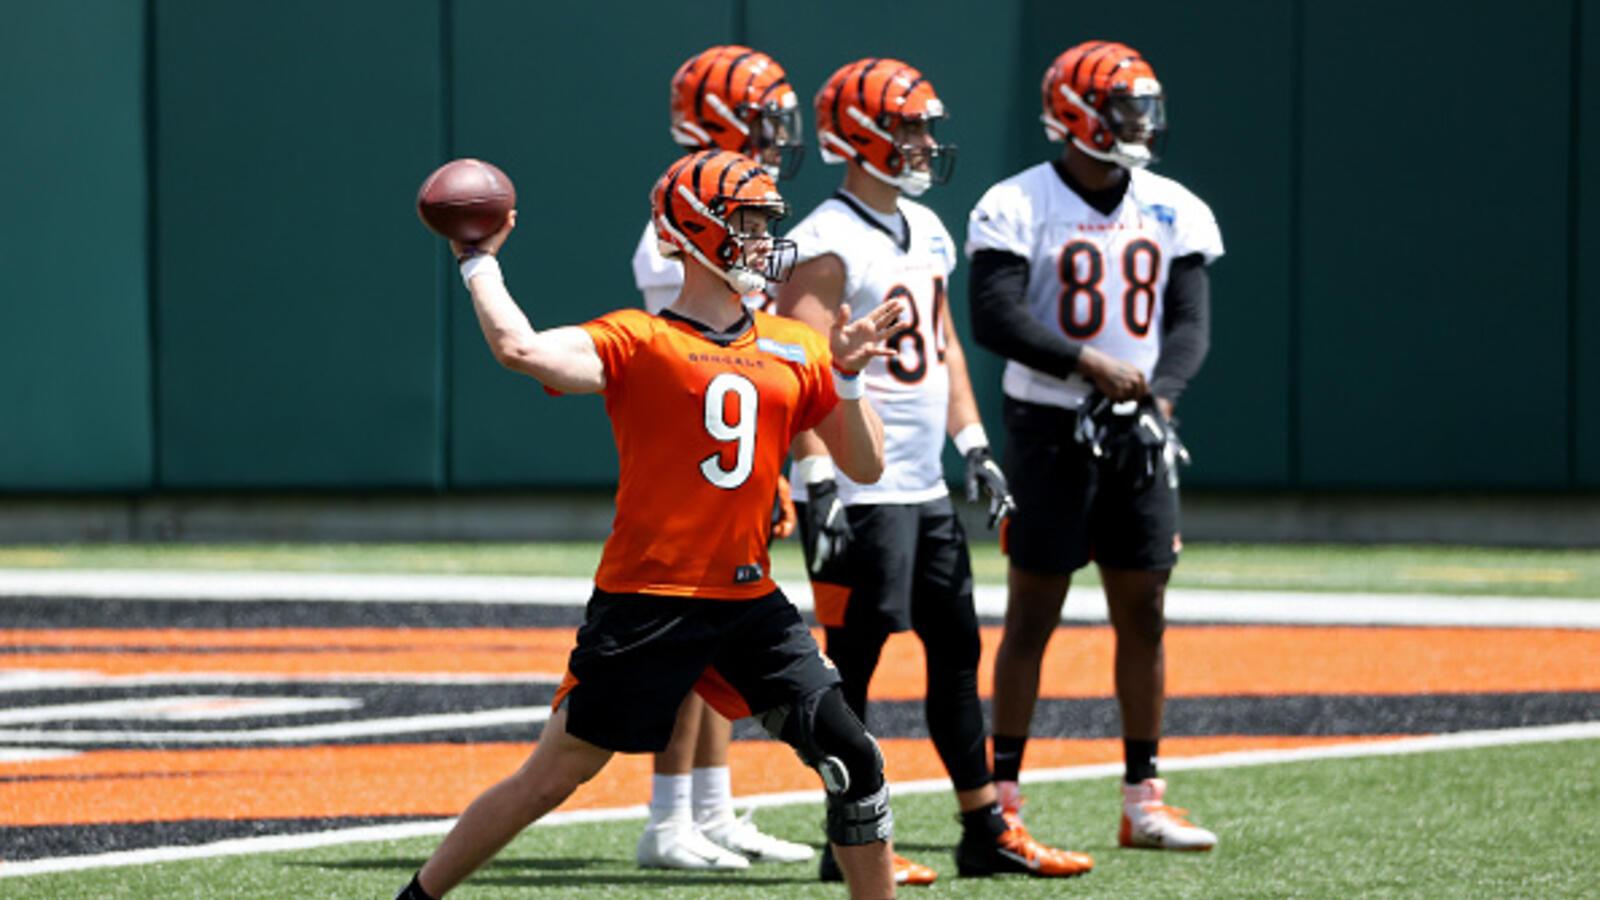 Podcast: Talking Bengals with James Rapien